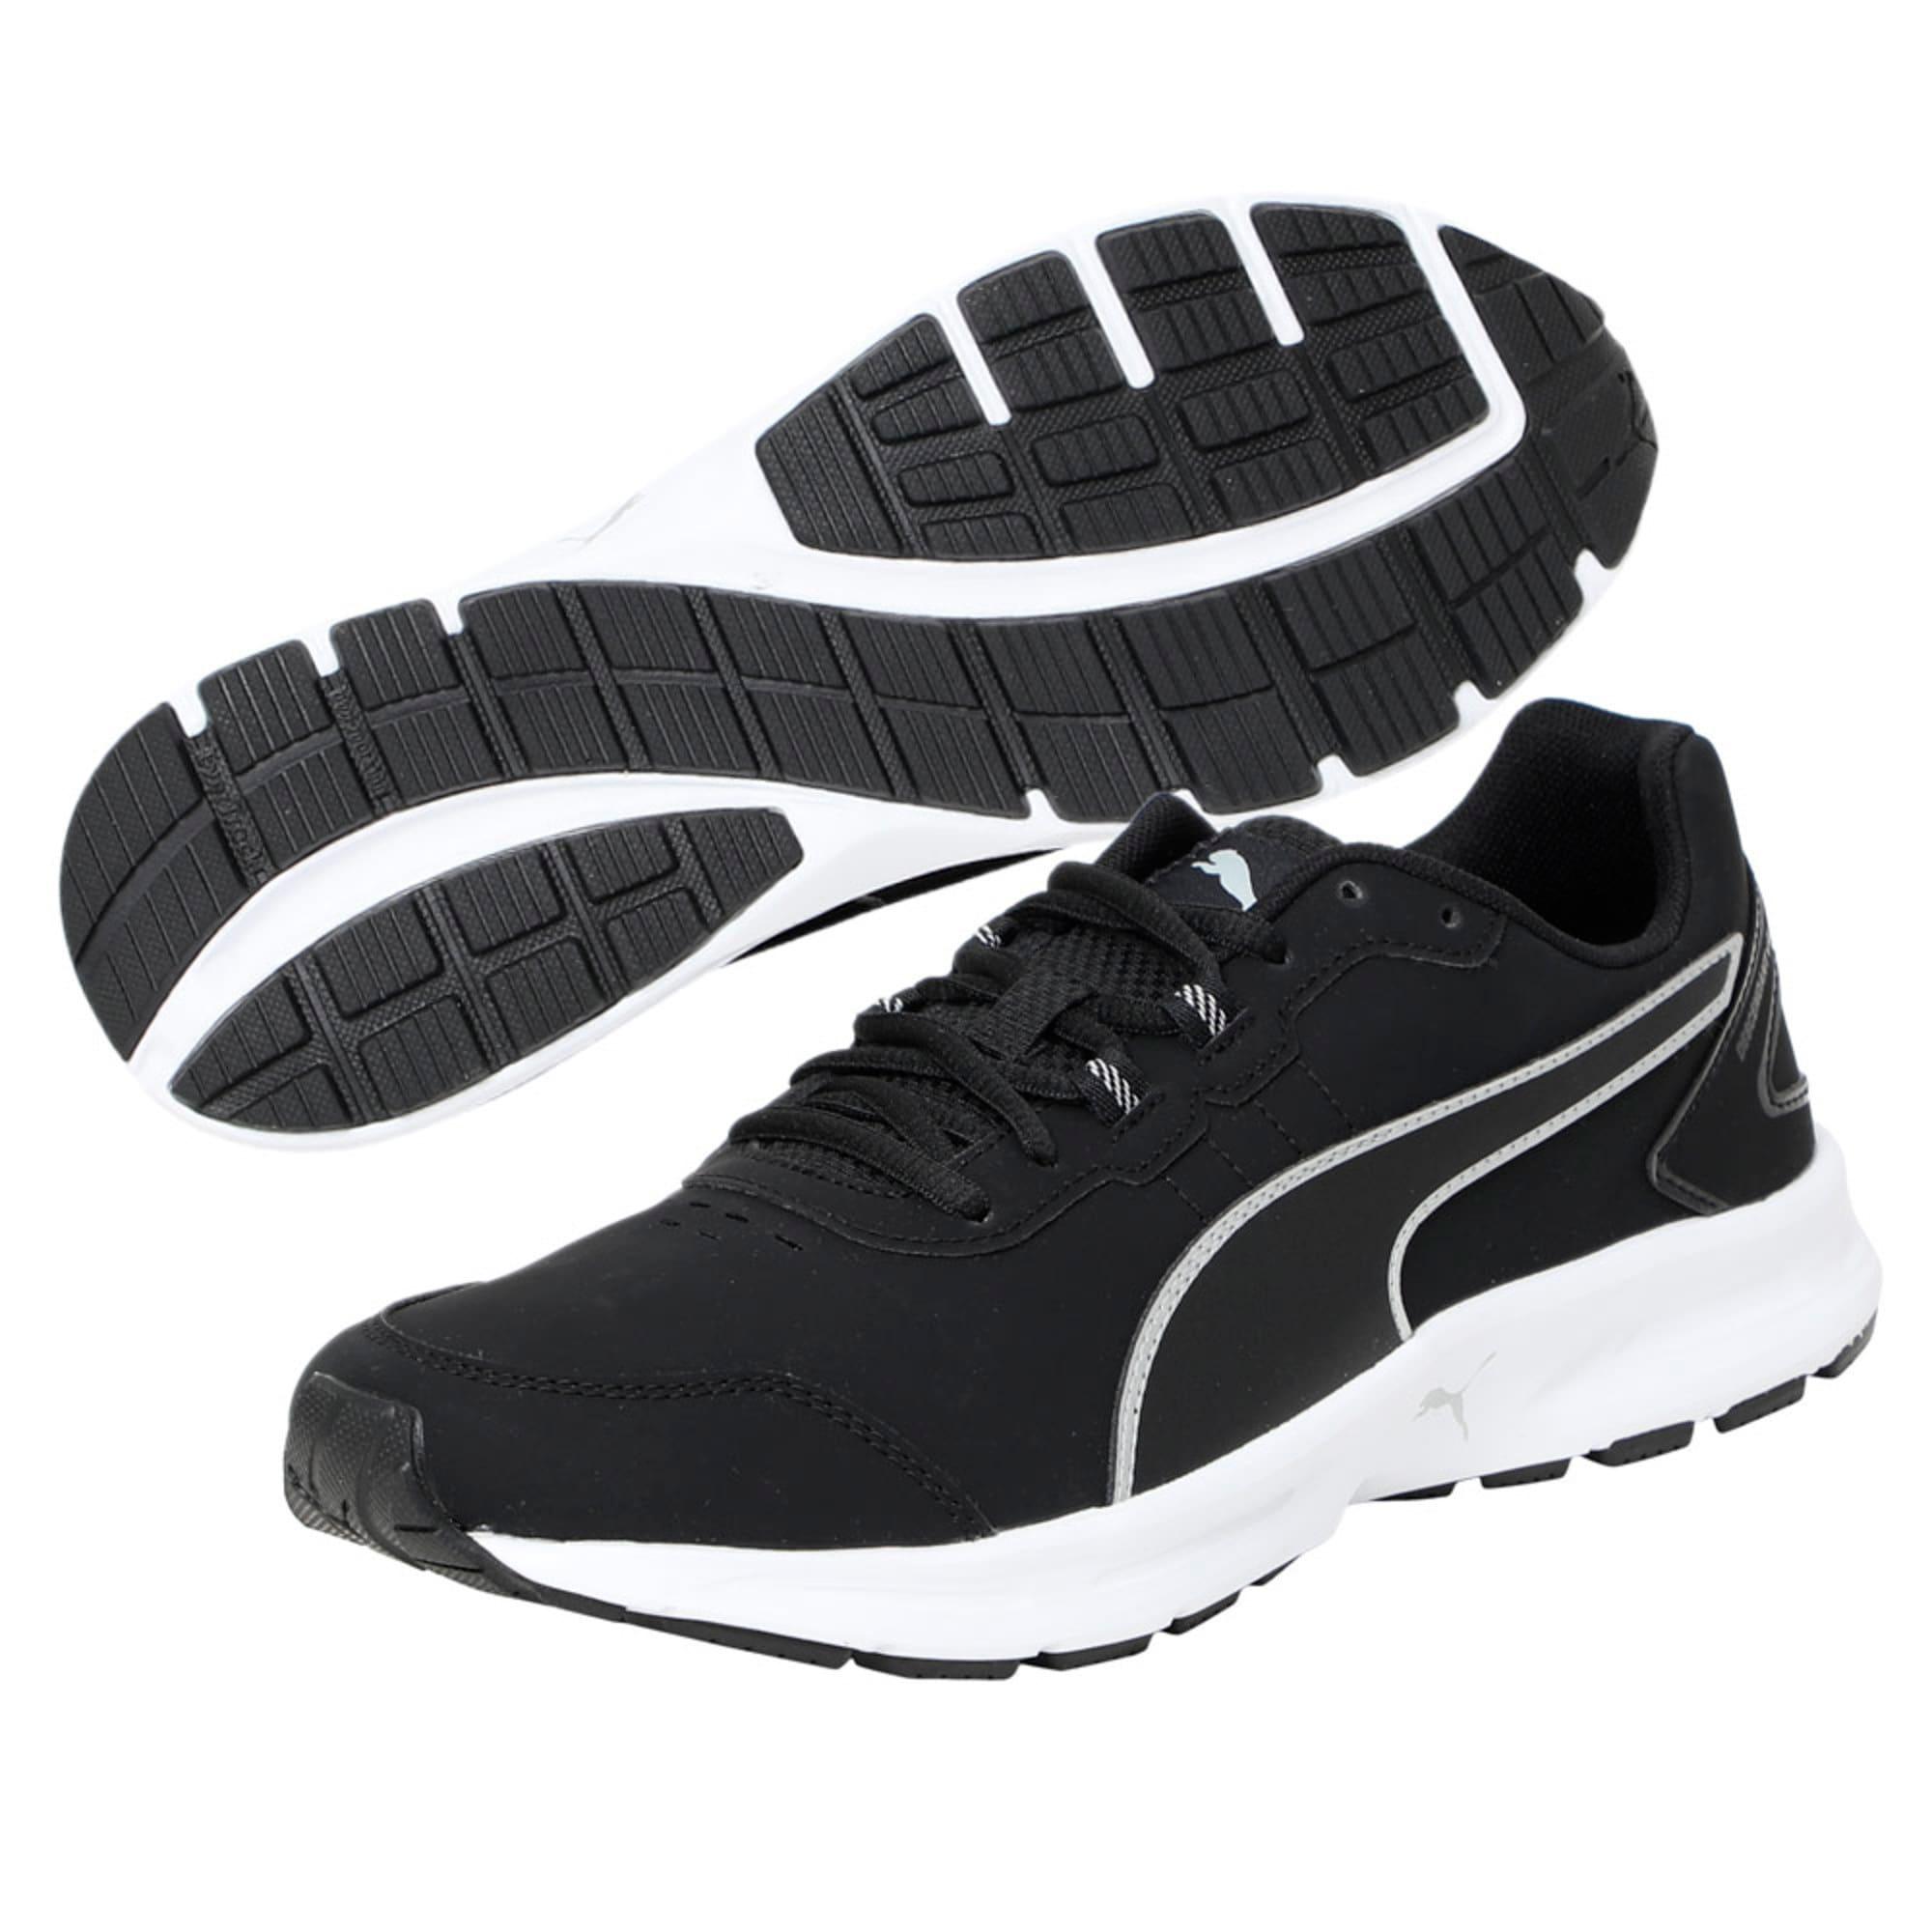 Thumbnail 5 of Descendant v4 SL Running Shoes, Puma Black-Puma Silver, medium-IND